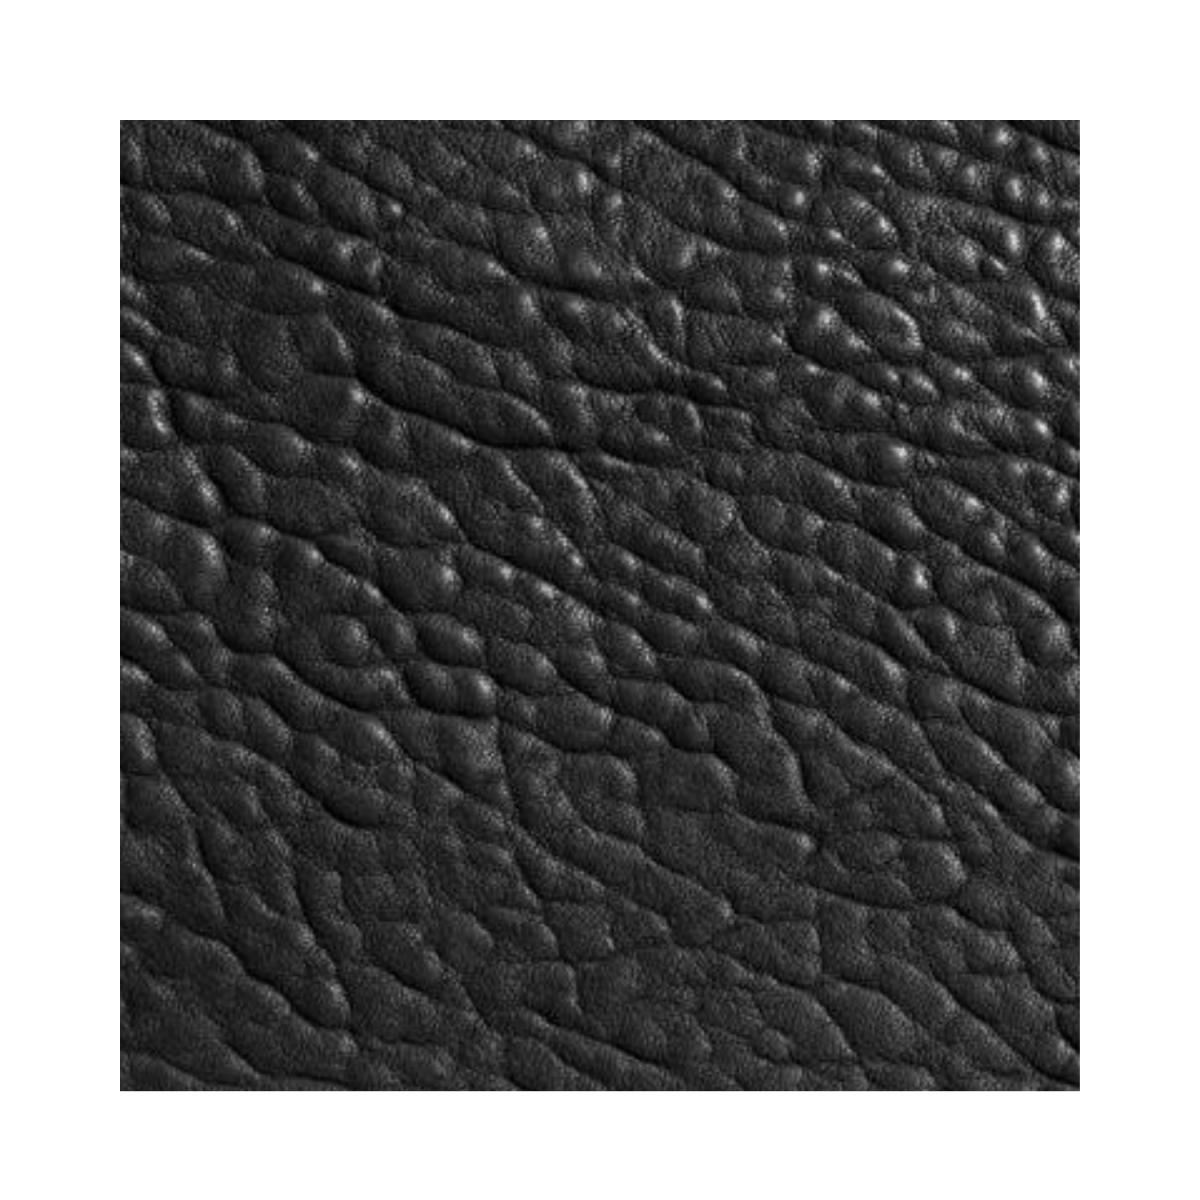 igor taske - black - kvalitet